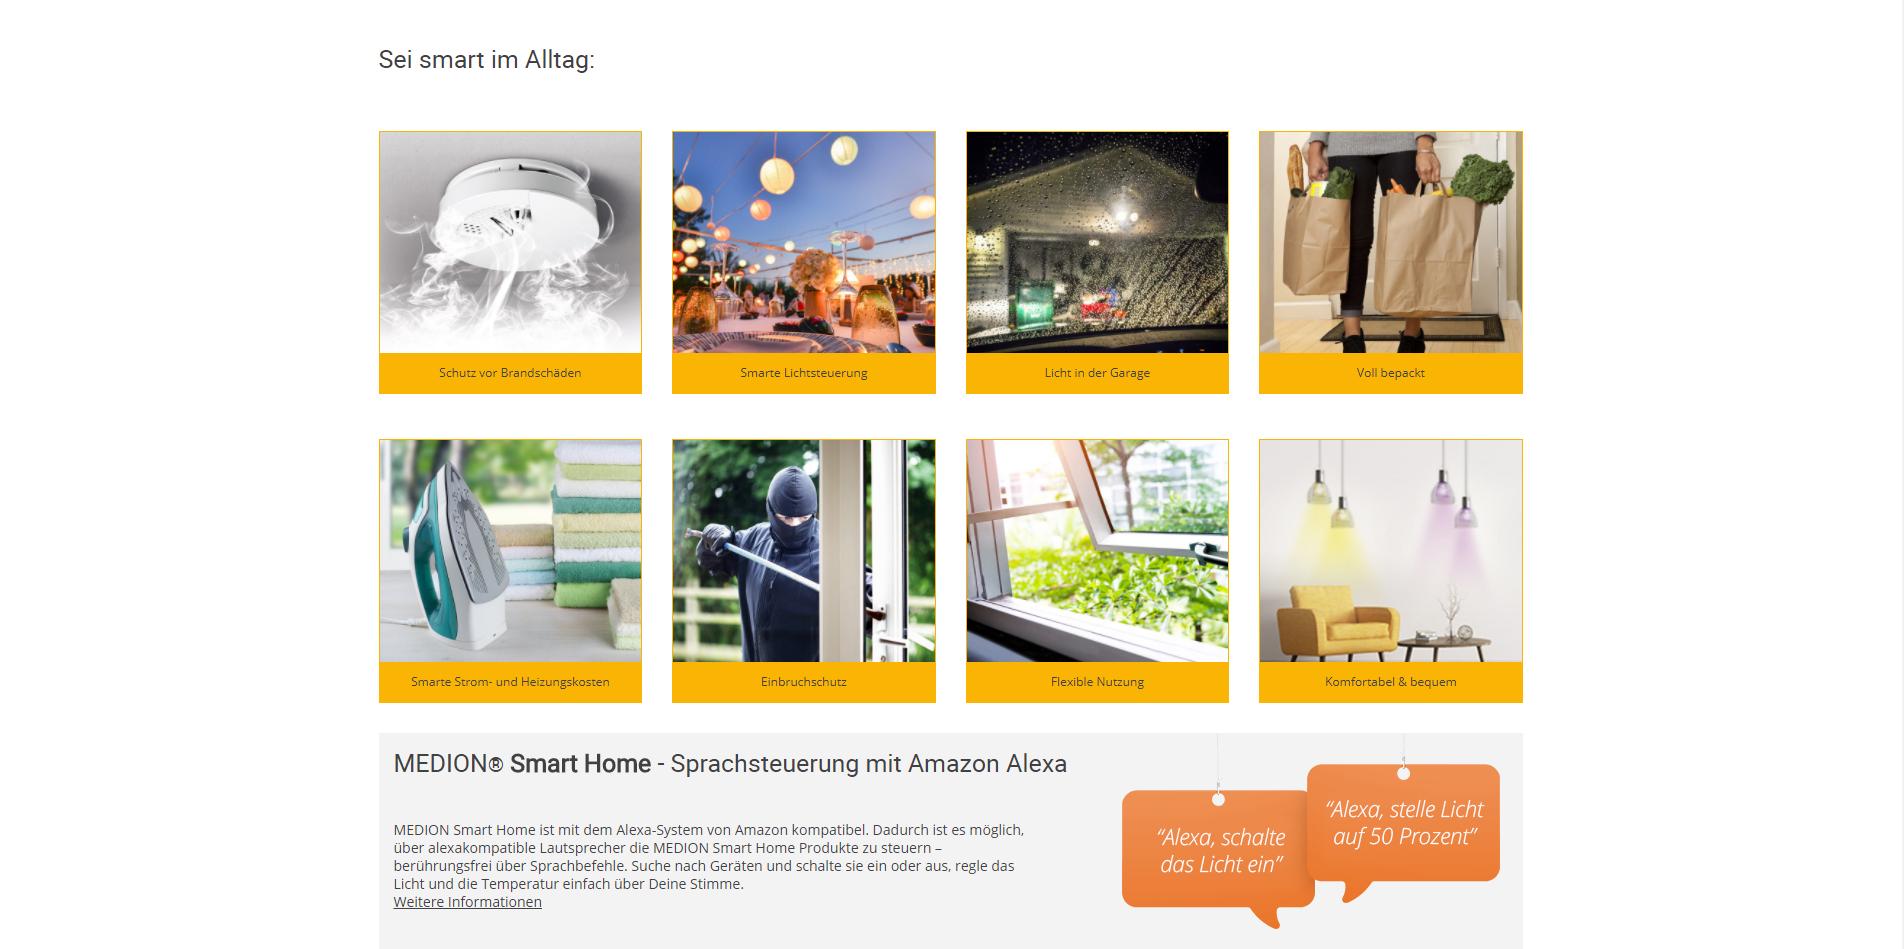 medion smart home anbieter szenarien screenshot 3 azu. Black Bedroom Furniture Sets. Home Design Ideas